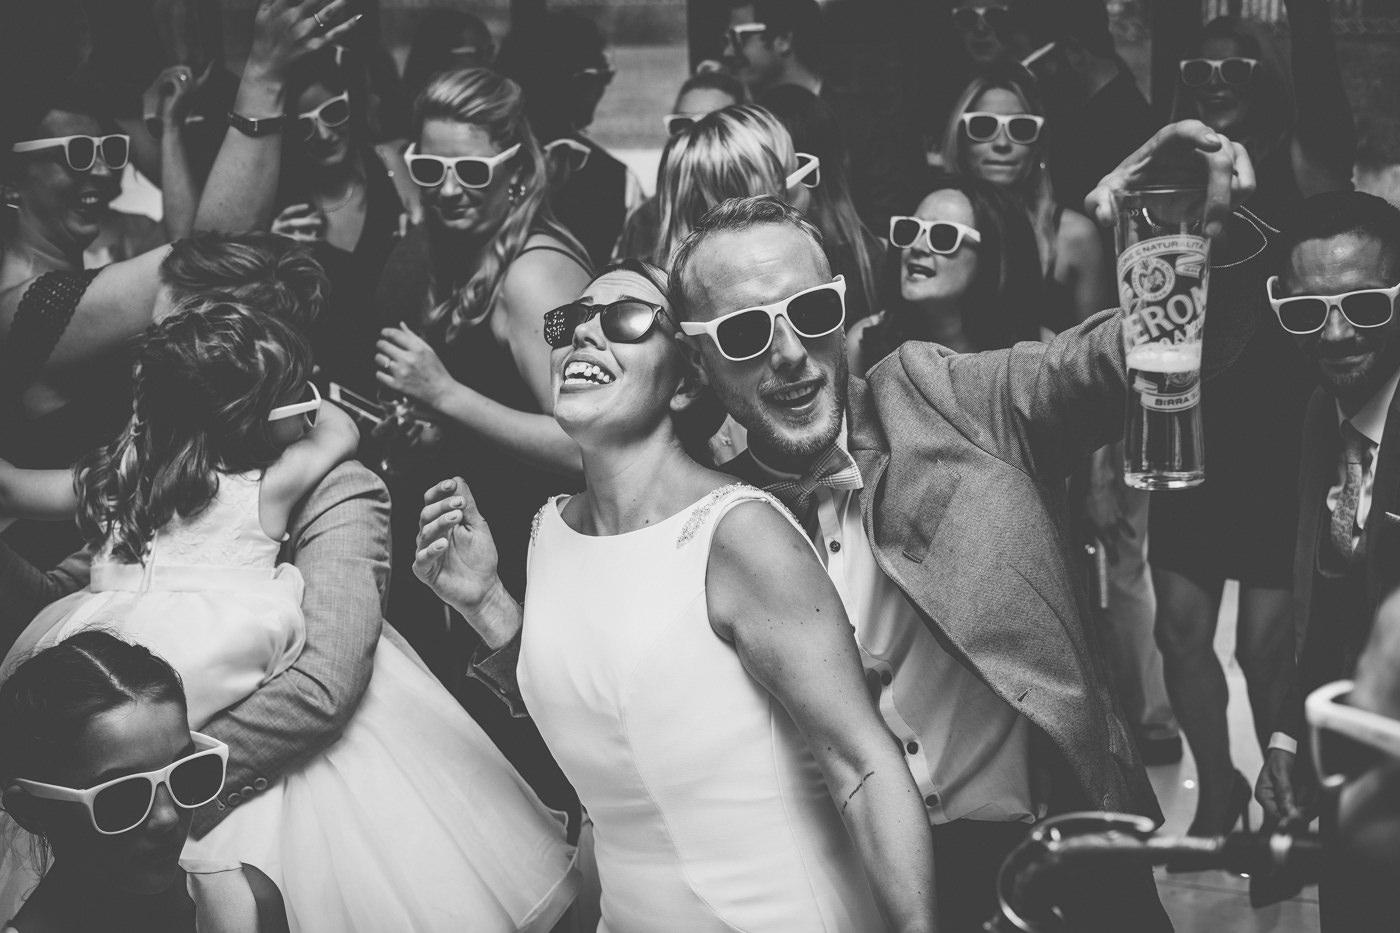 Aston Marina Wedding photographer, Fun Wedding Photography, Natural Wedding Photography, Same Sex Wedding